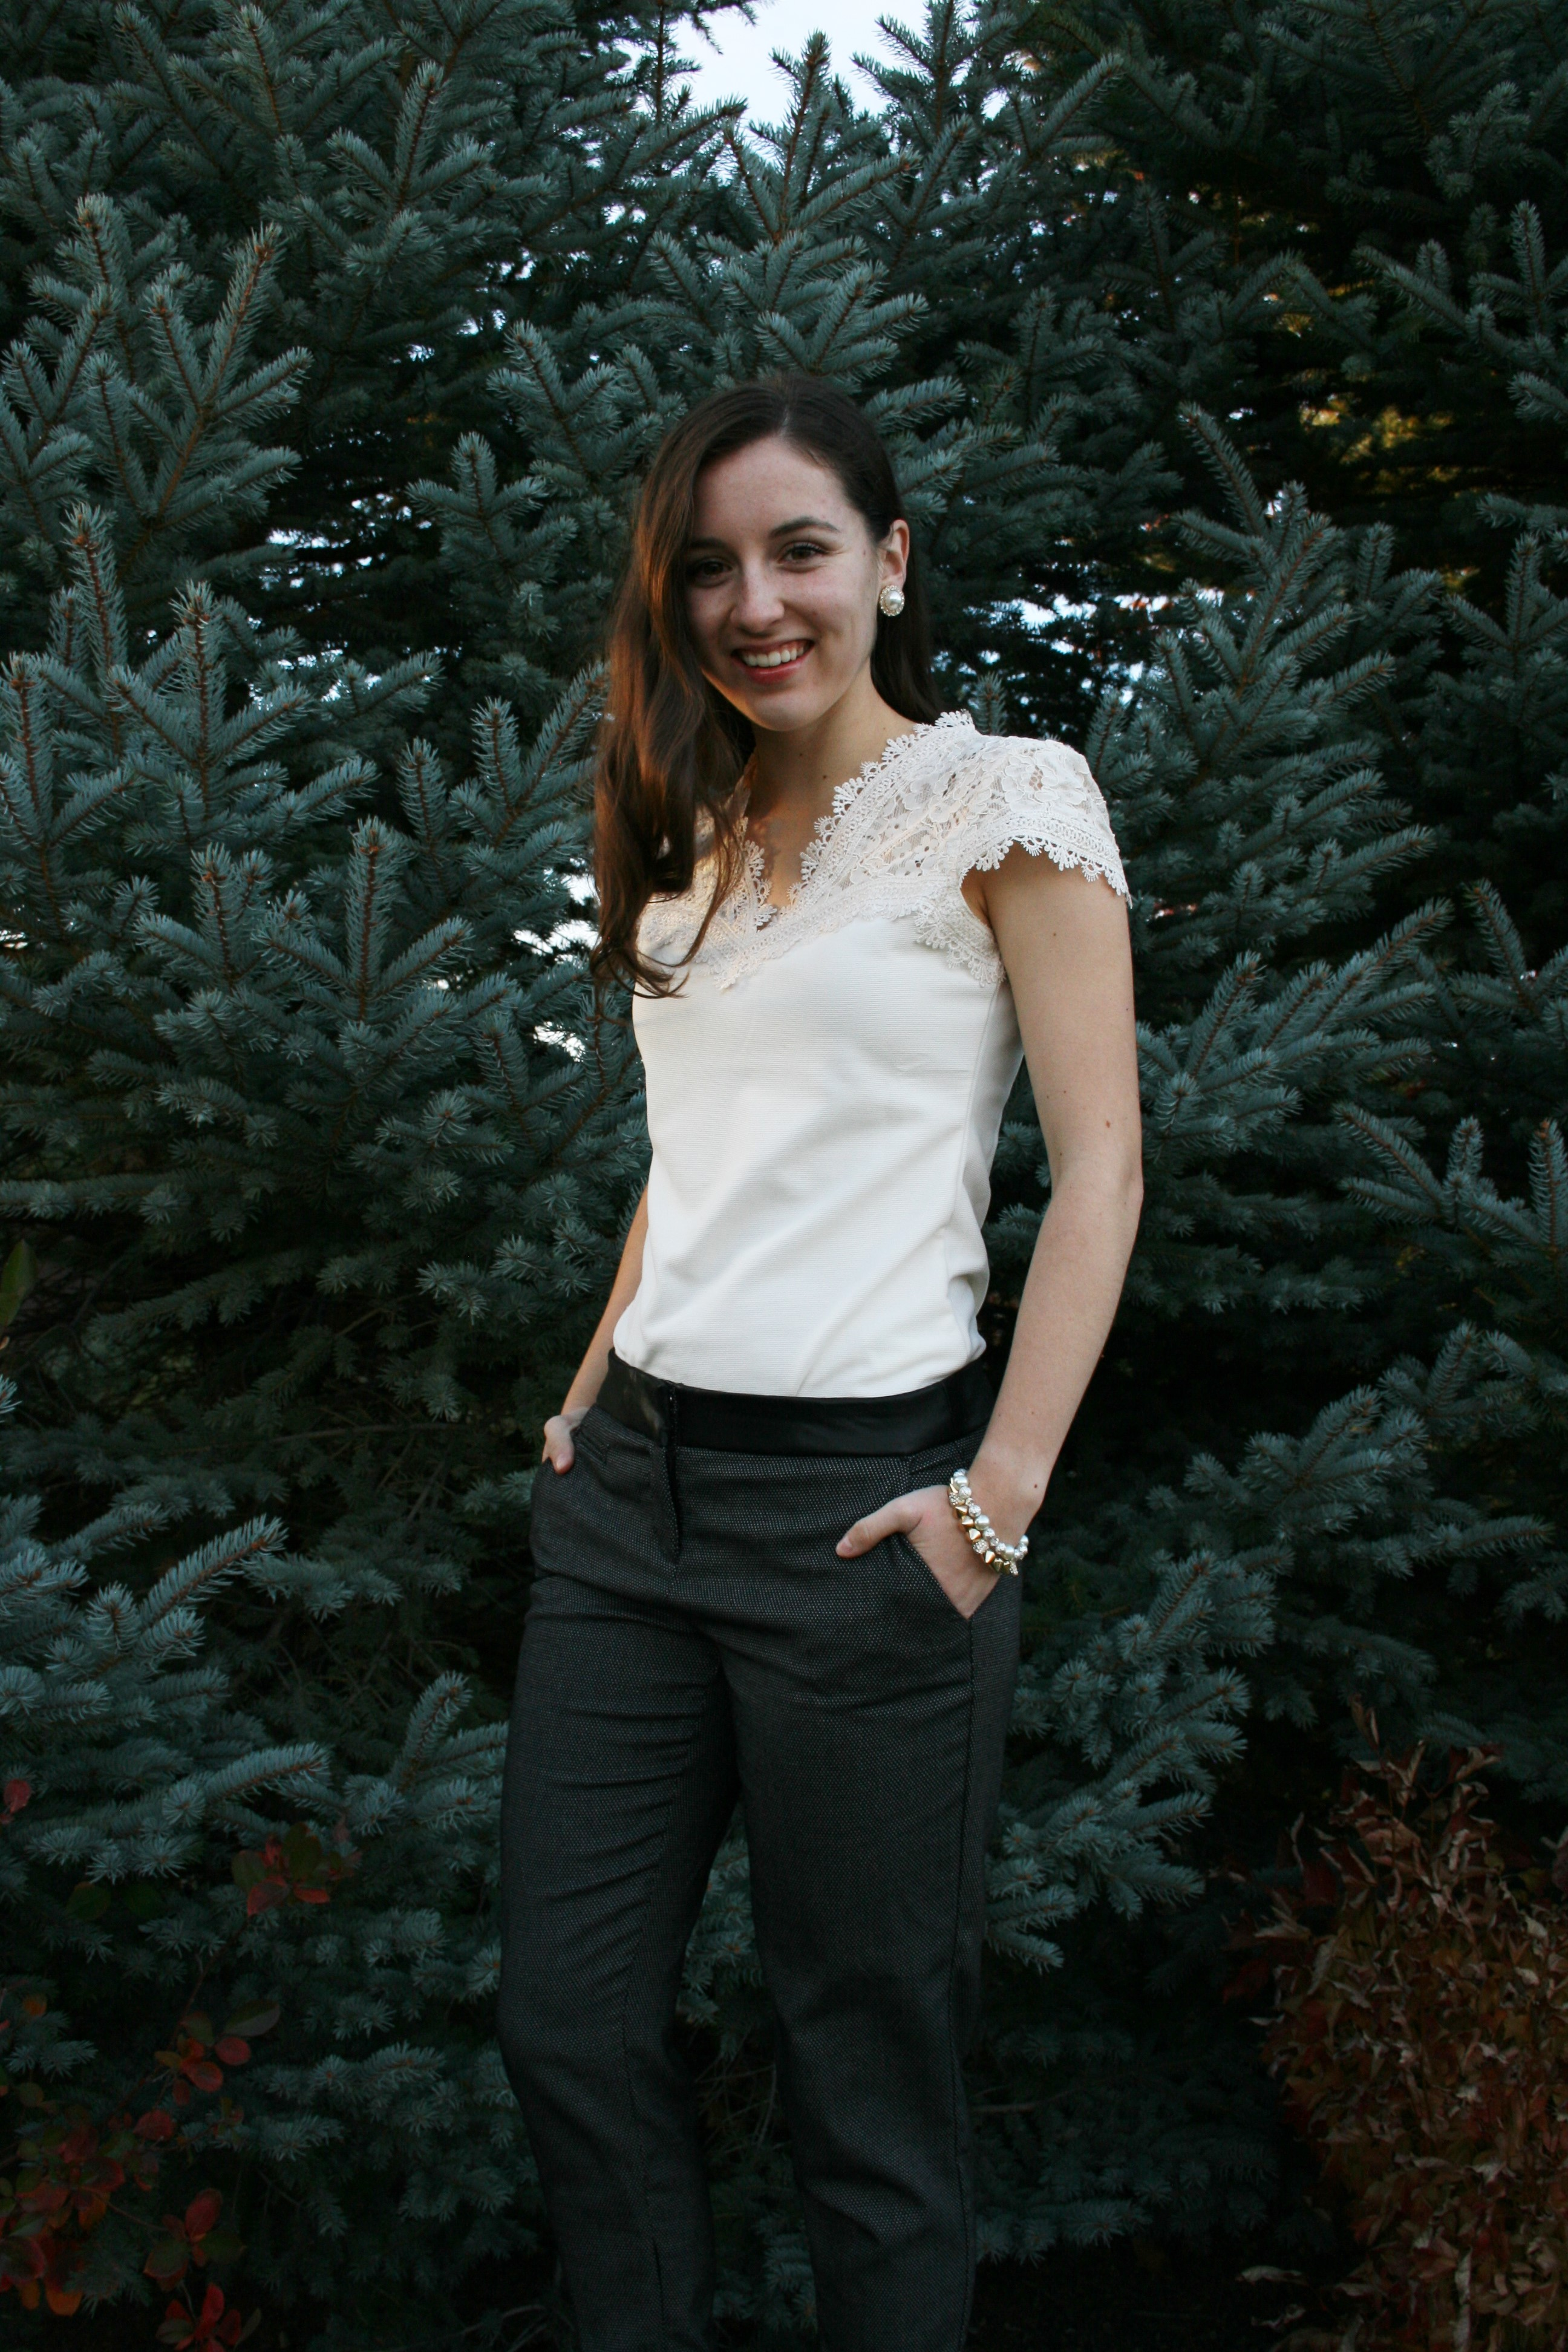 lace H&M blouse, work wear, corporate fashion